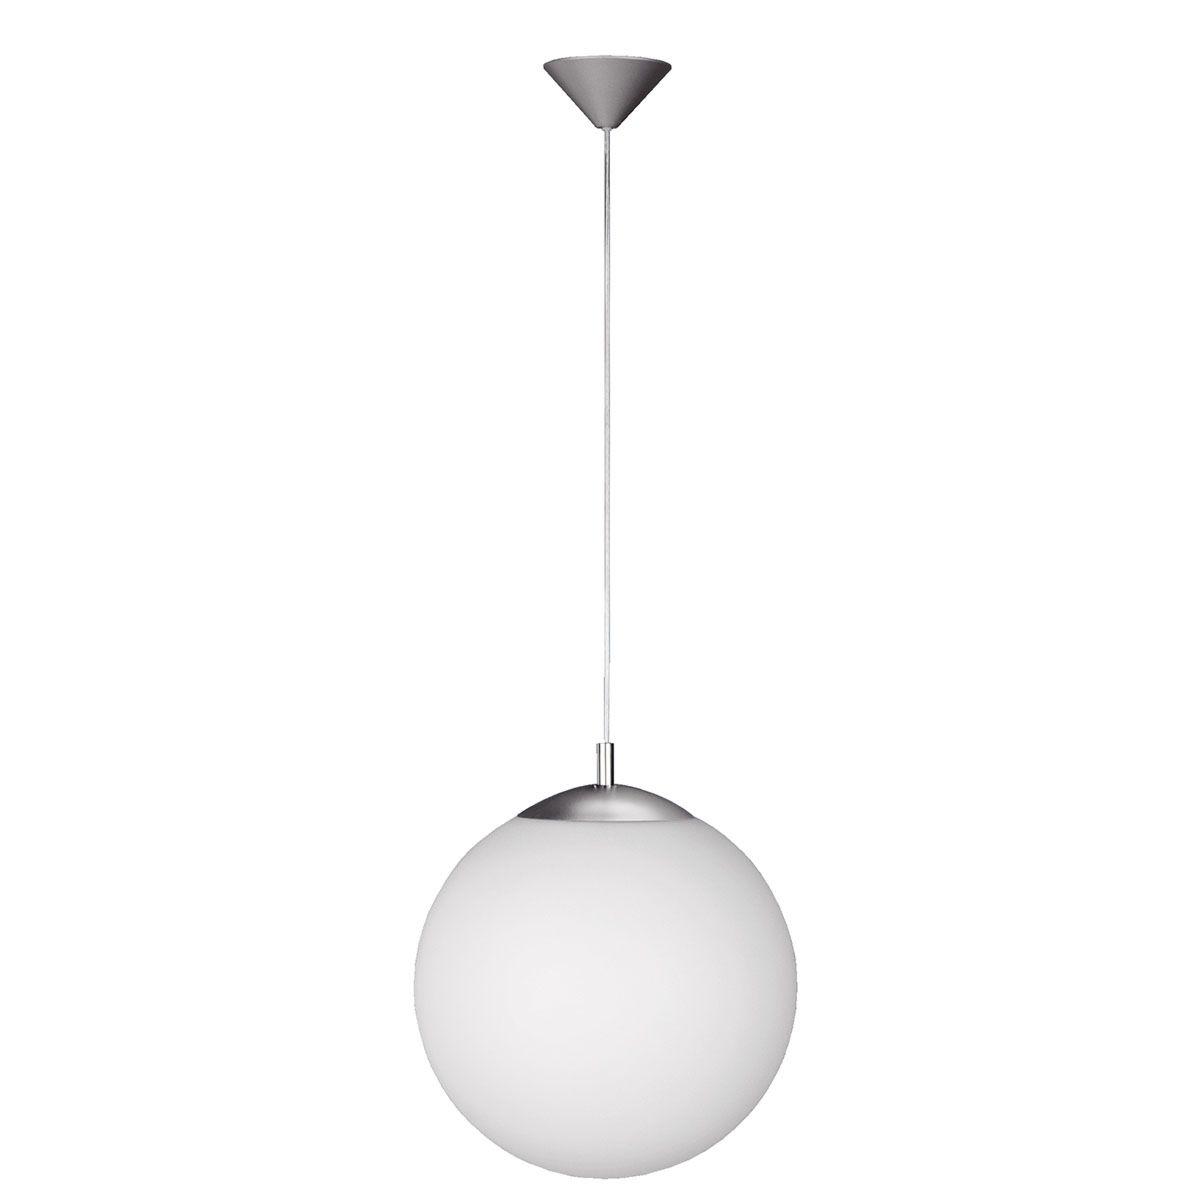 Wofi Point Pendant Light 35cm Diameter -  Nickel Matt Finish